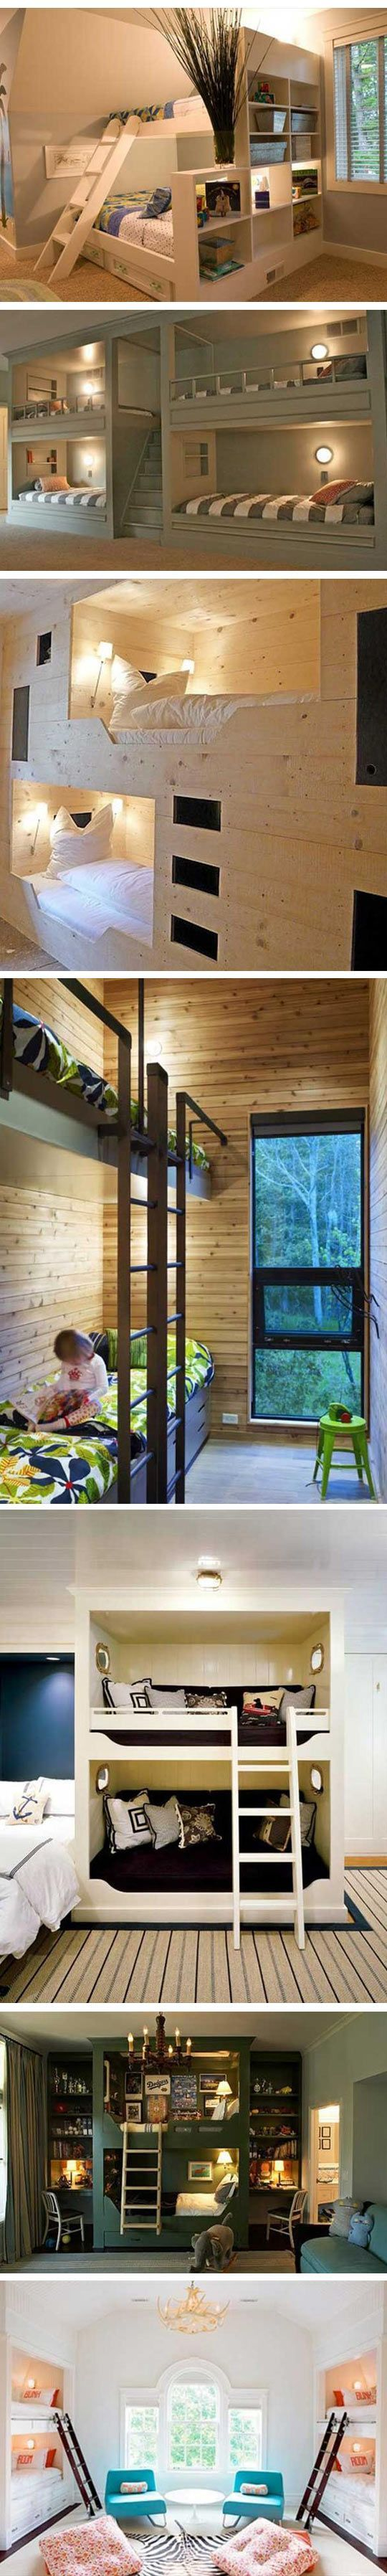 The Coolest Bunk Beds Bunkrooms Pinterest Cool Bunk Beds